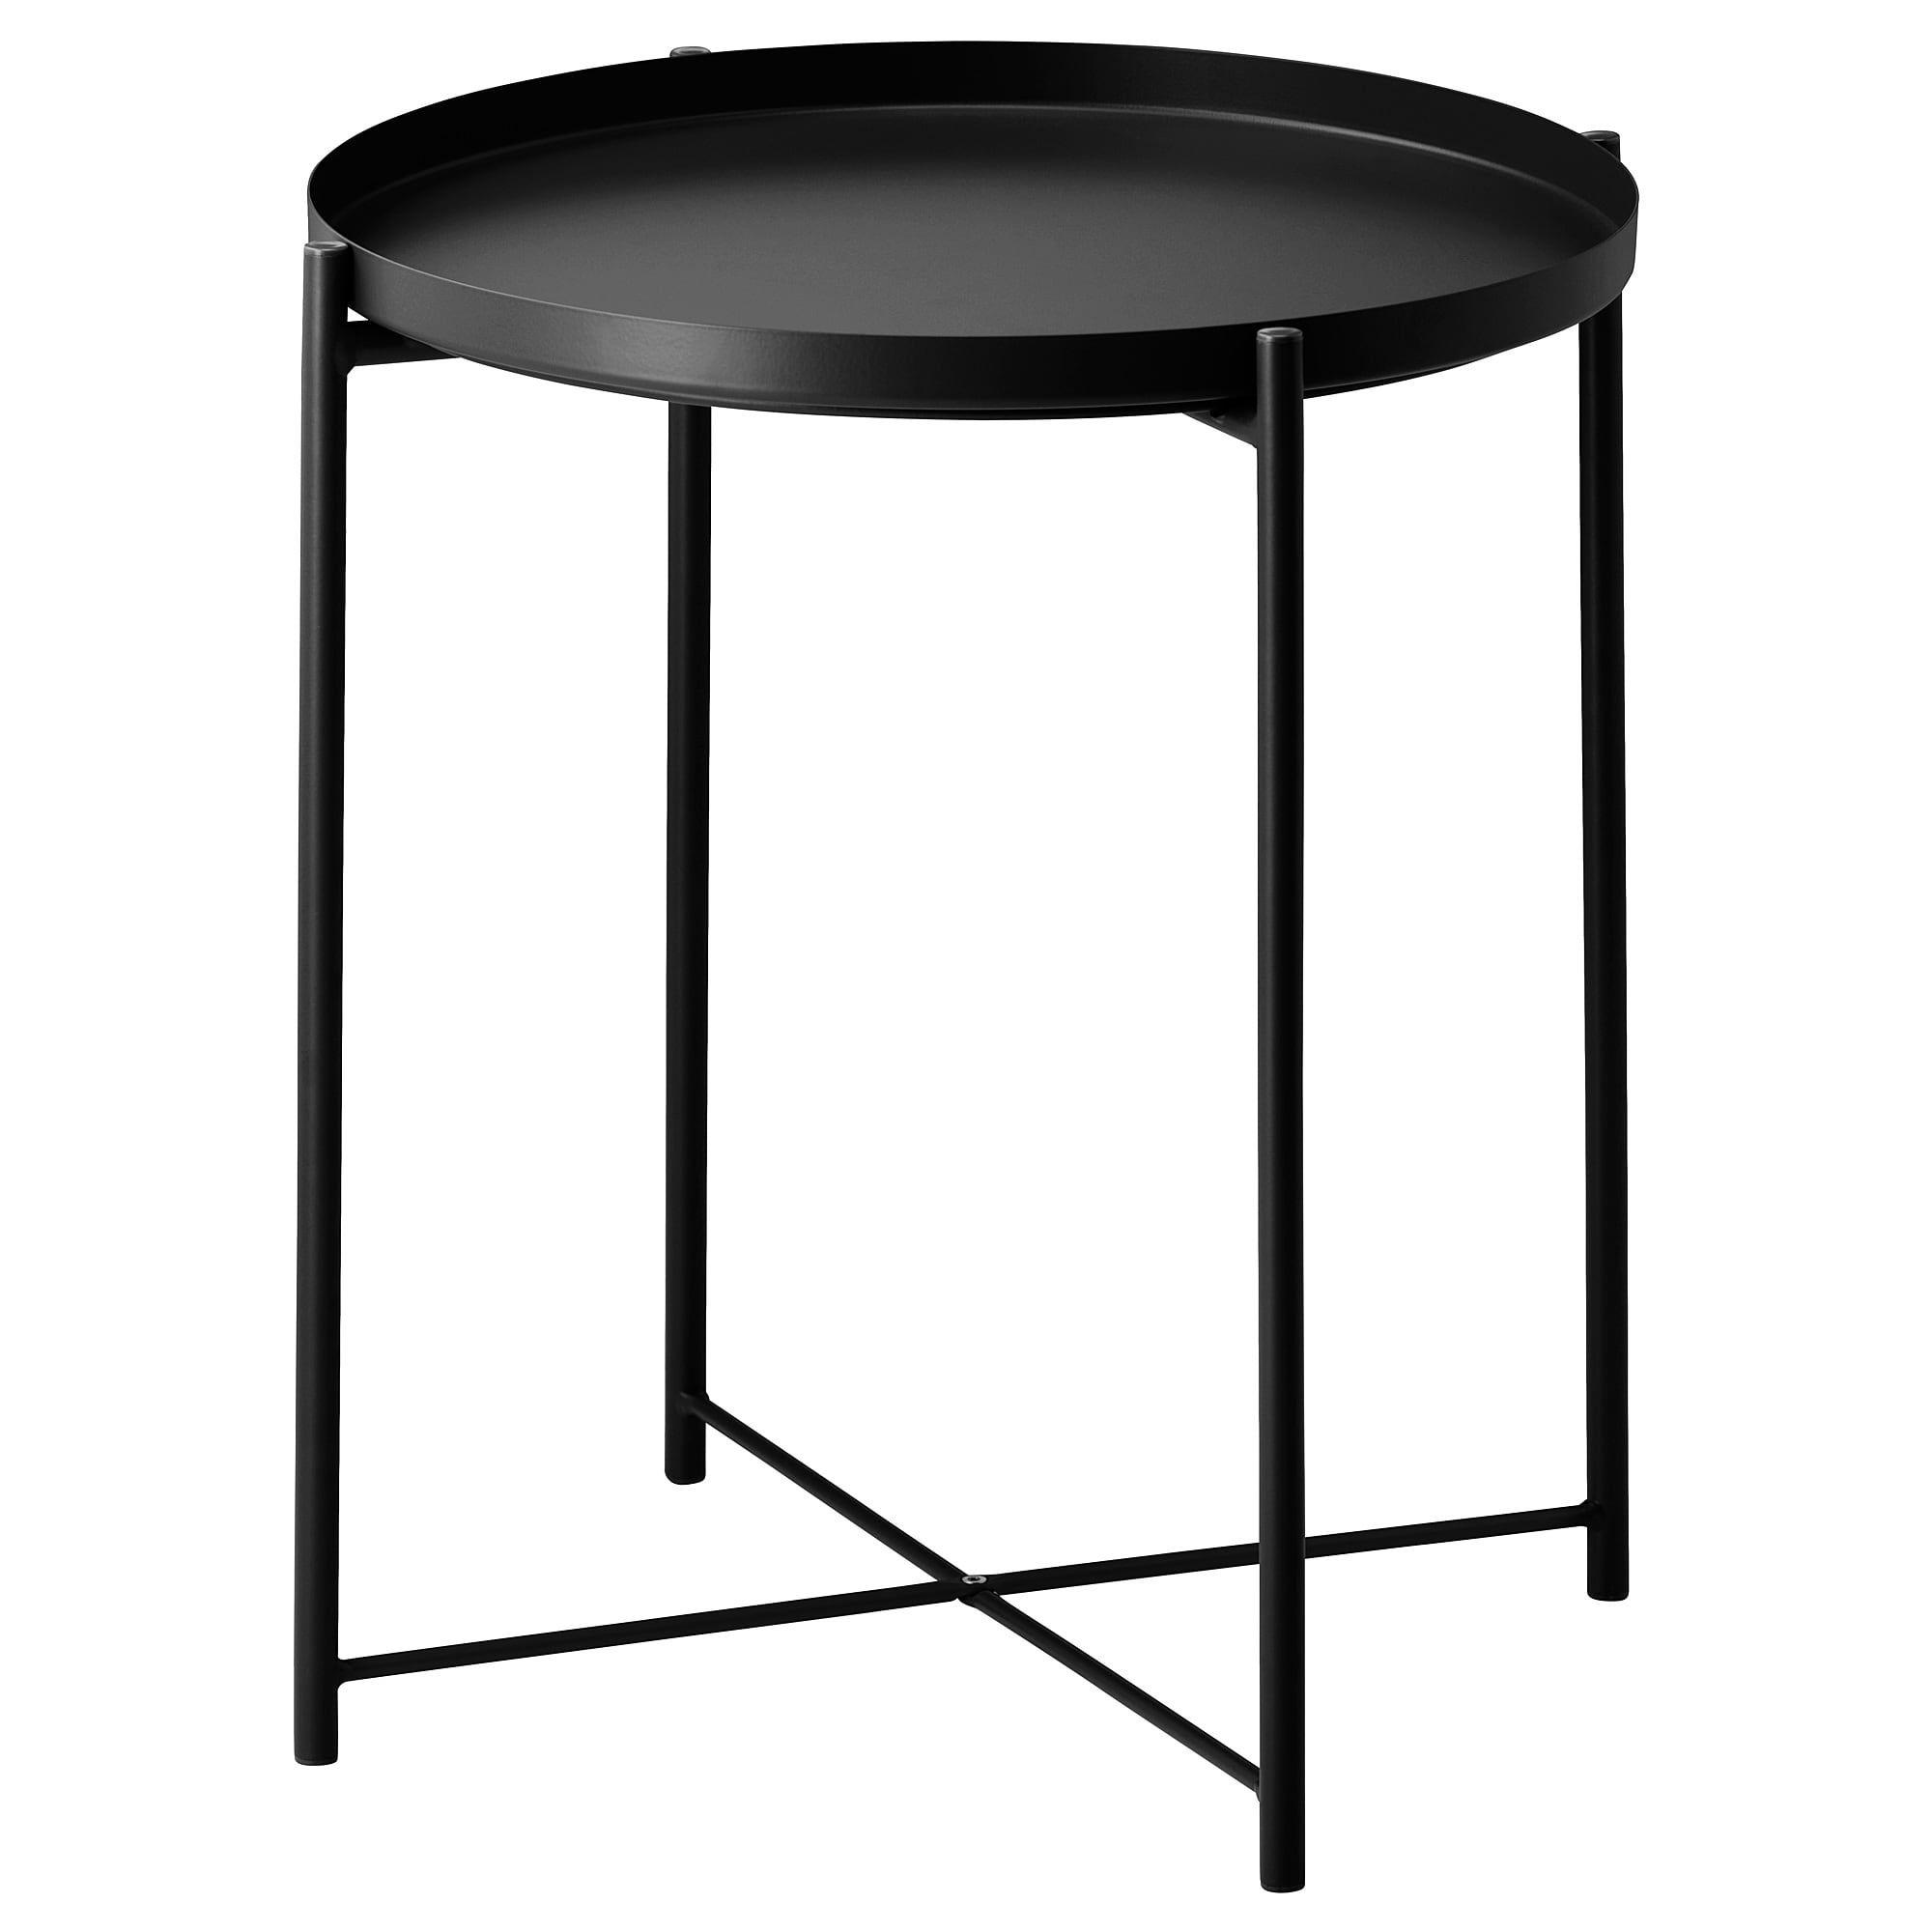 IKEA - GLADOM Tray table black | Ikea side table, Black ...